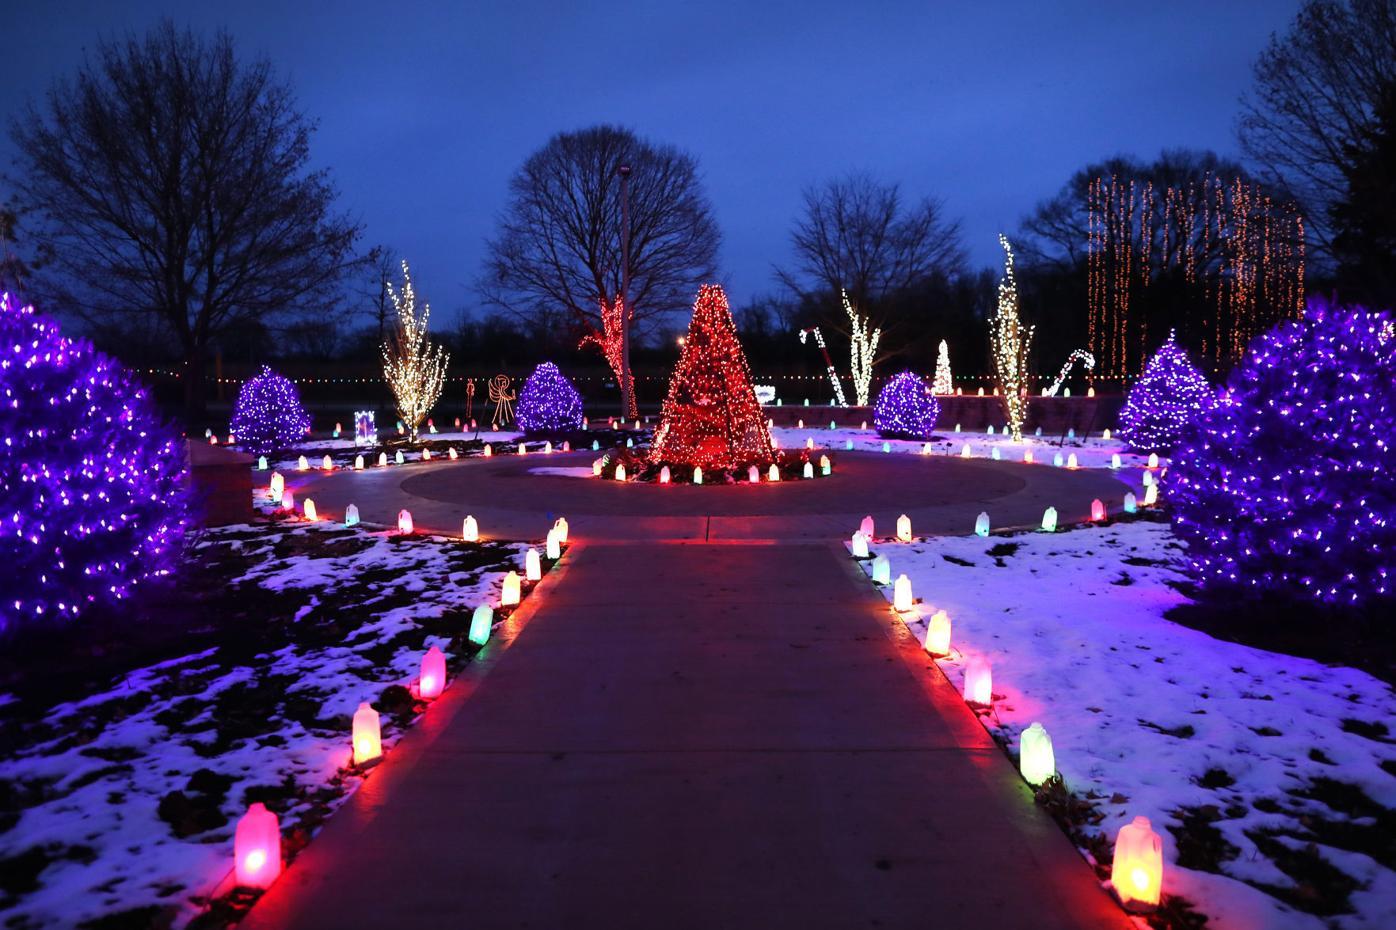 5dd9c96d7b3ae.image - Holiday Light Show Rotary Botanical Gardens December 22